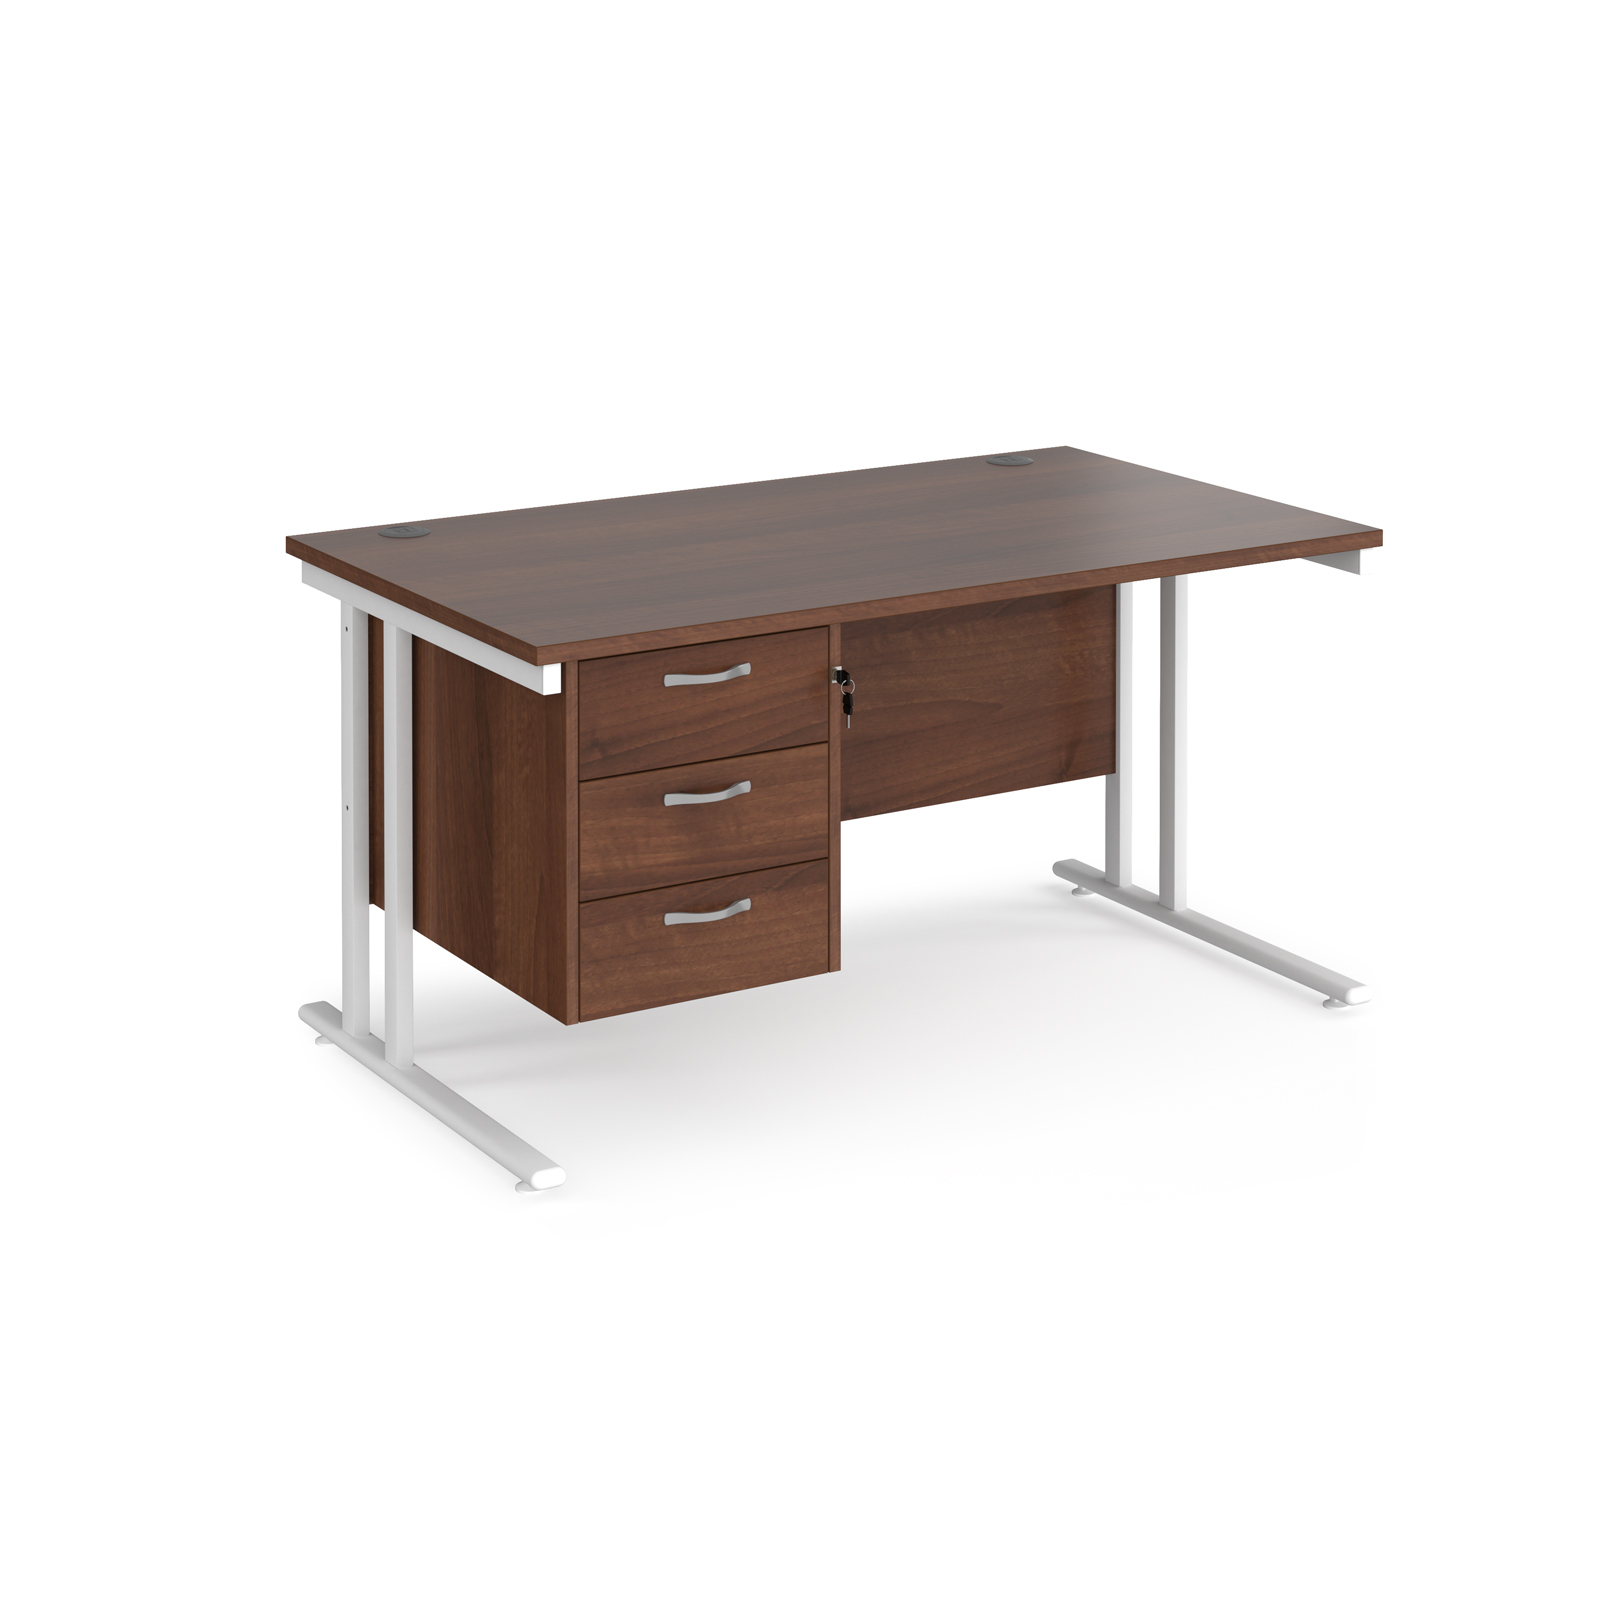 Rectangular Desks Maestro 25 straight desk 1400mm x 800mm with 3 drawer pedestal - white cantilever leg frame, walnut top